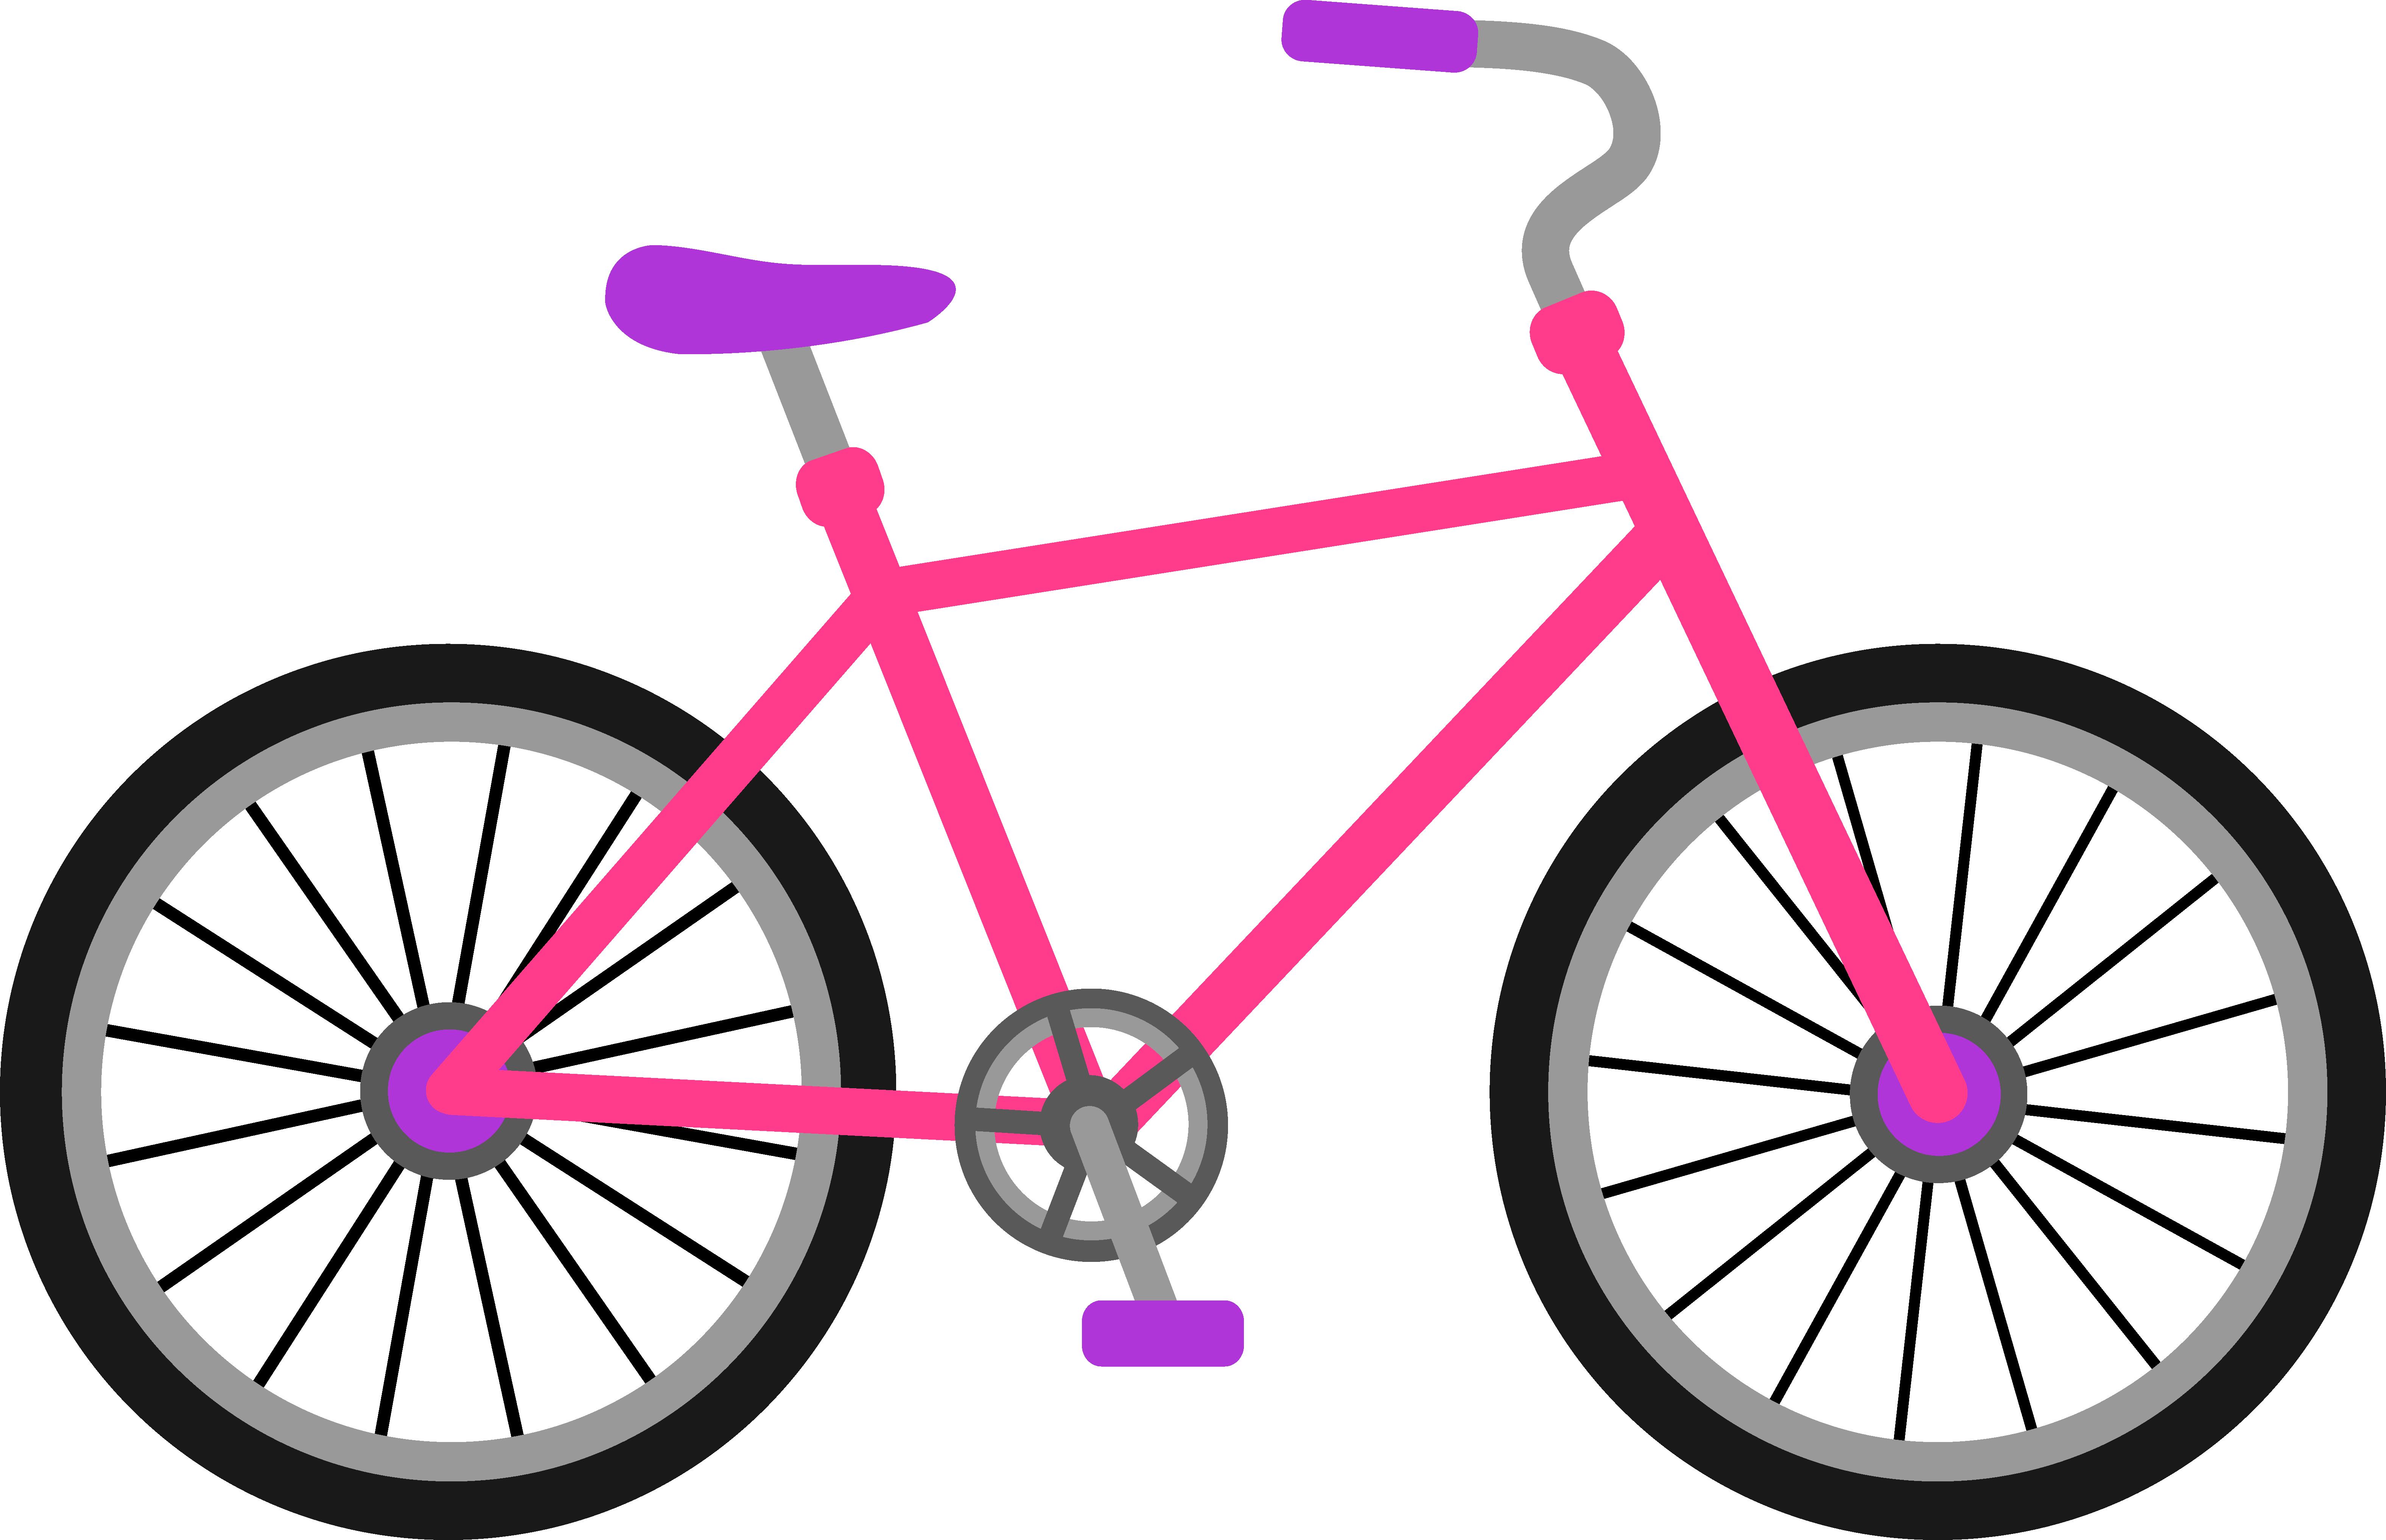 Bicycle panda free images. Bike clipart